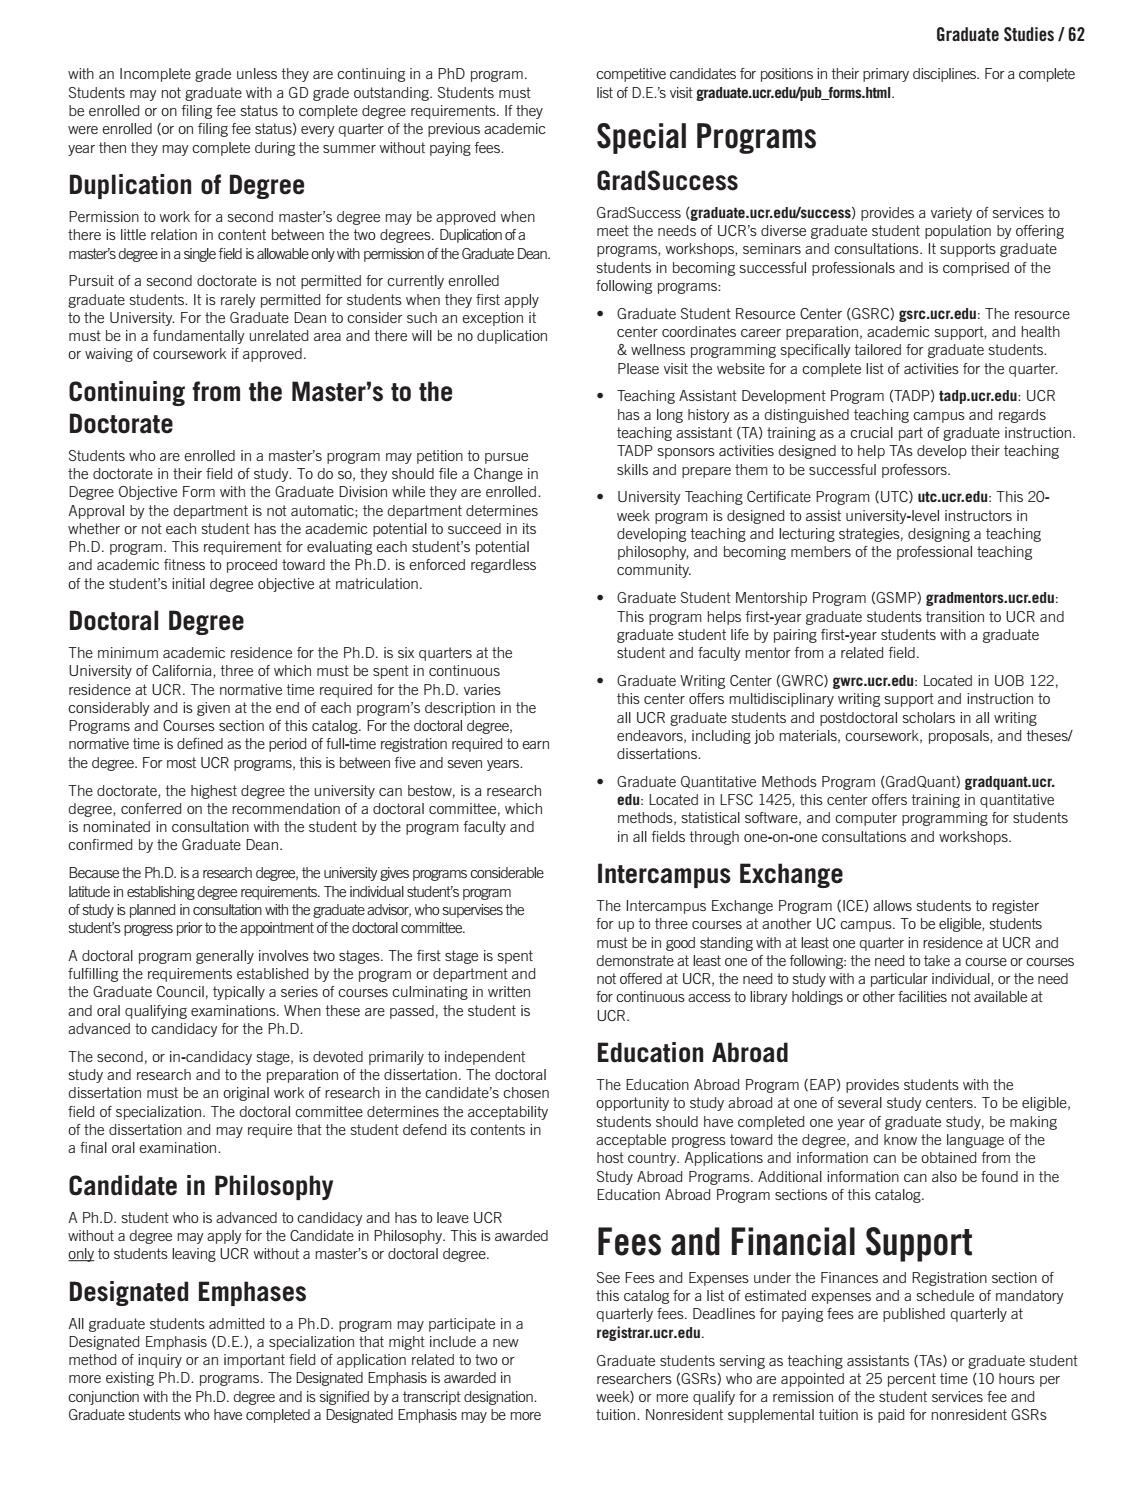 UC Riverside General Catalog 16-17 by UCR SAMC - issuu